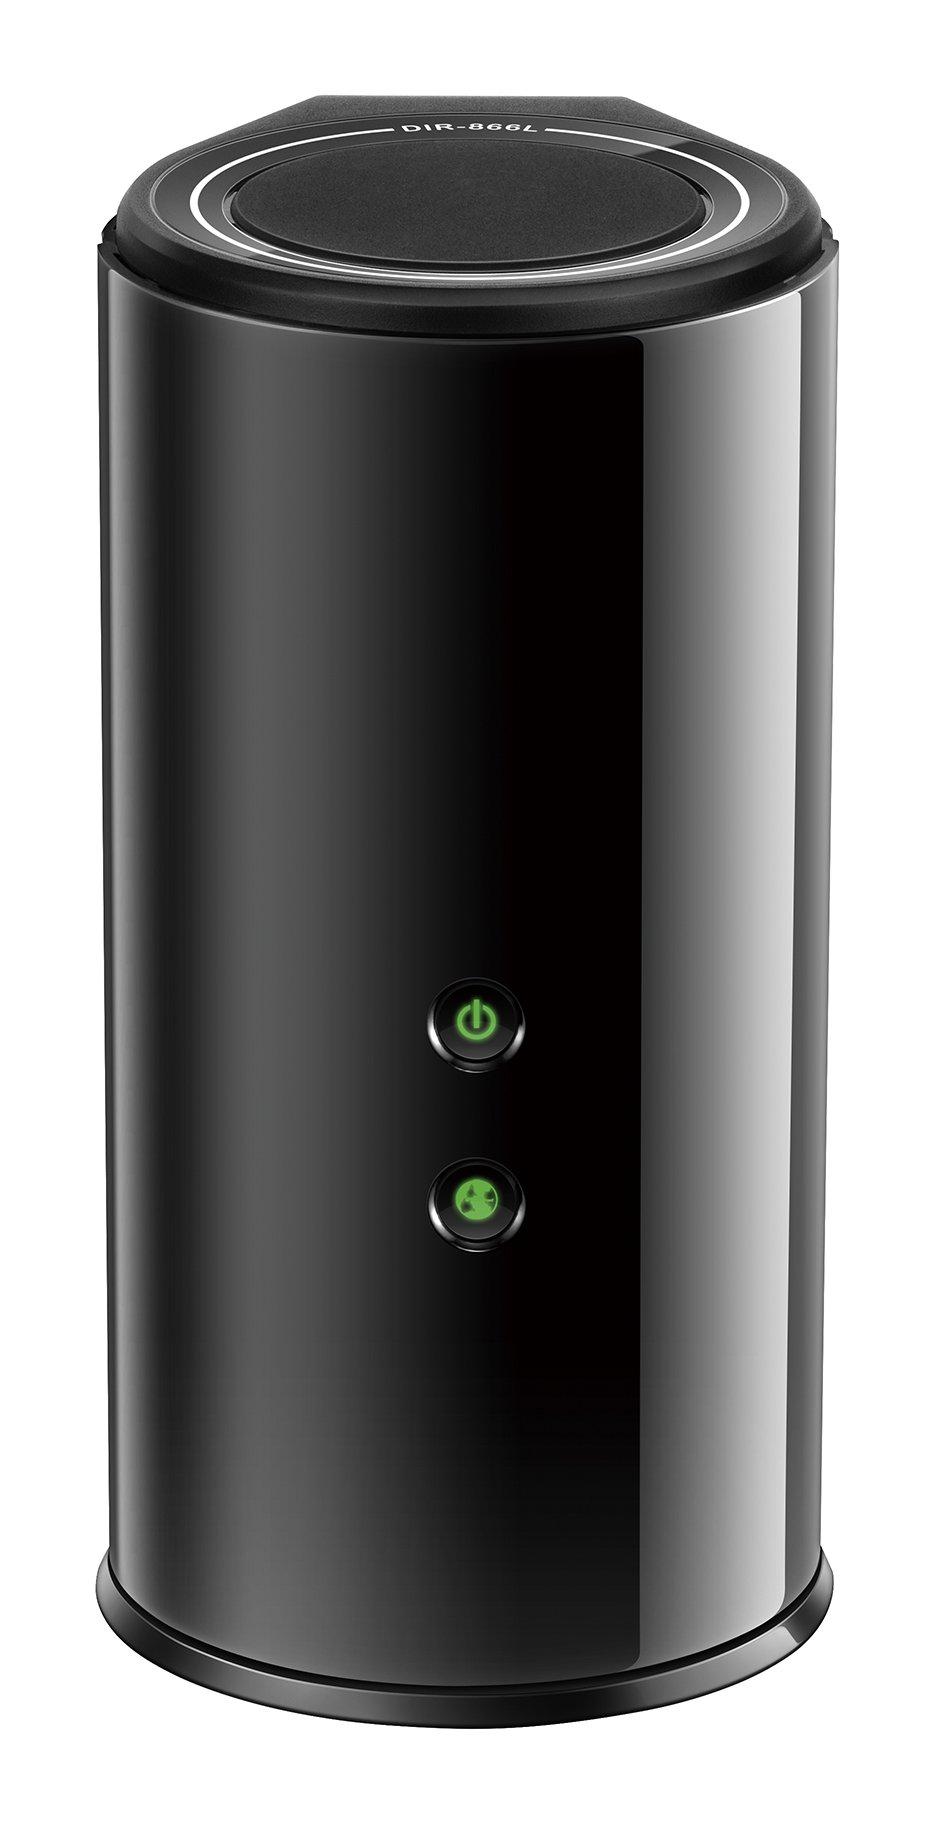 D-Link Wireless AC Smart Beam 1750 Mbps Home Cloud App-Enabled Dual-Band Gigabit Router (DIR-866L) by D-Link